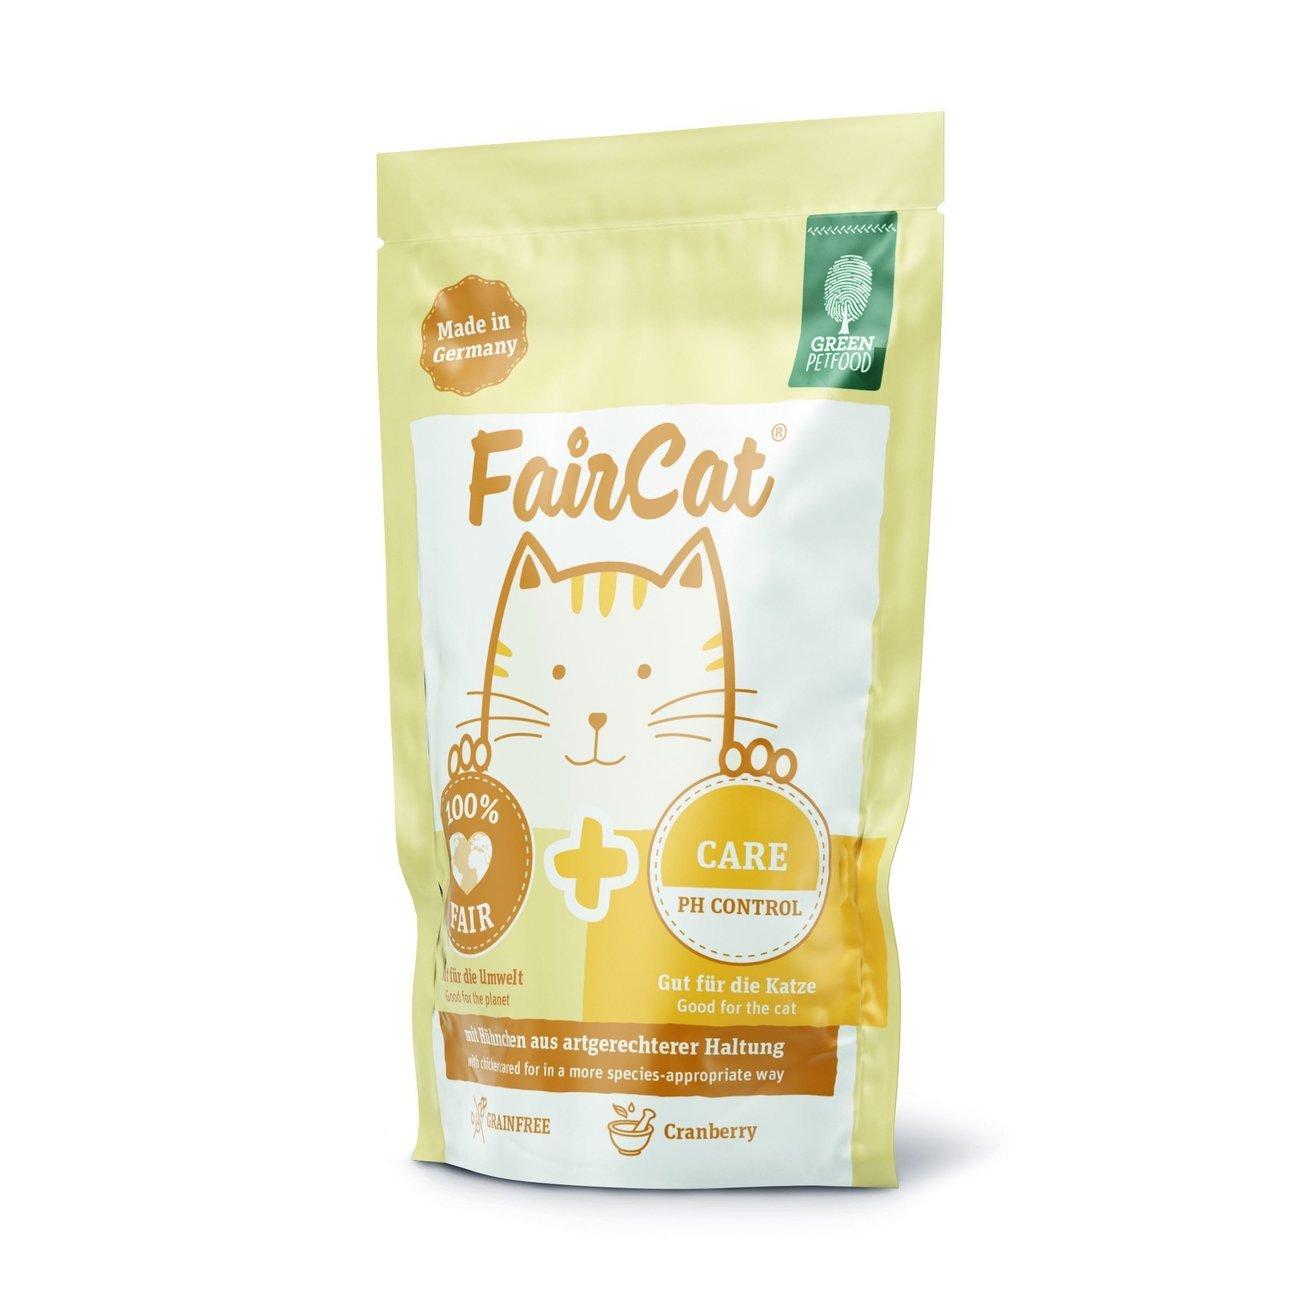 Green Petfood FairCat Care Katzenfutter, Bild 2